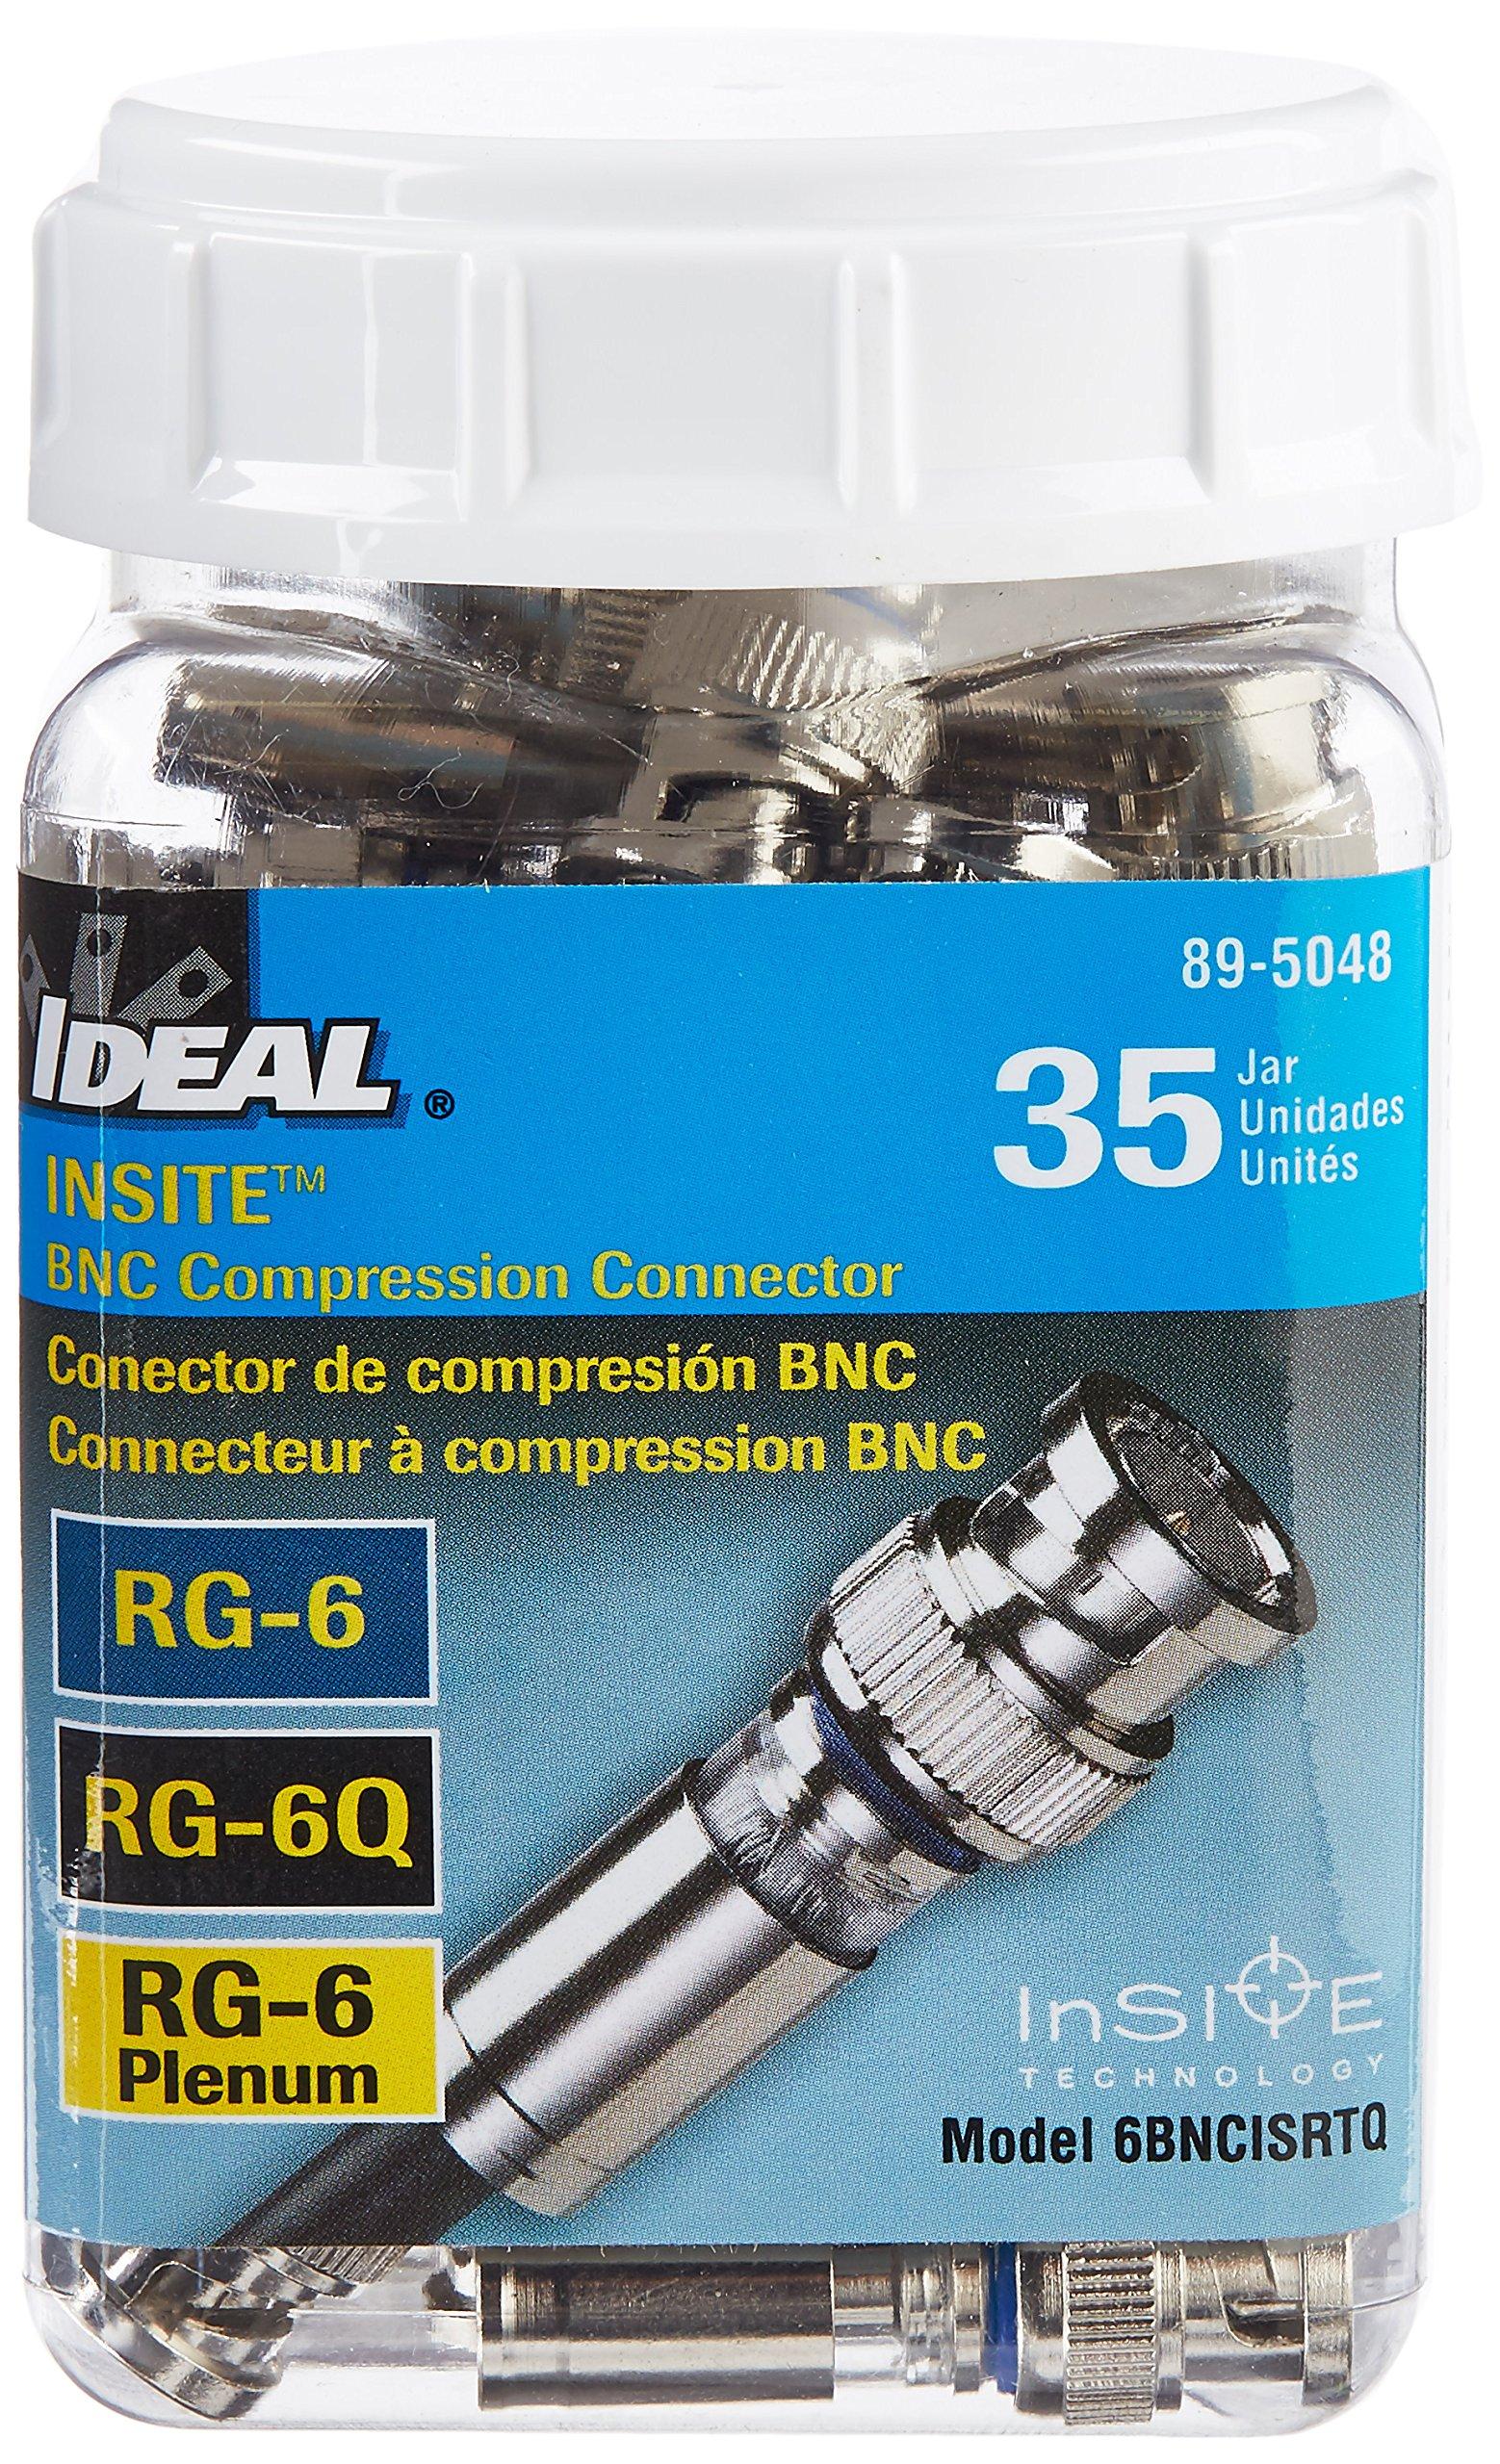 Ideal 89-5048 RG-6 BNC Compression Connector